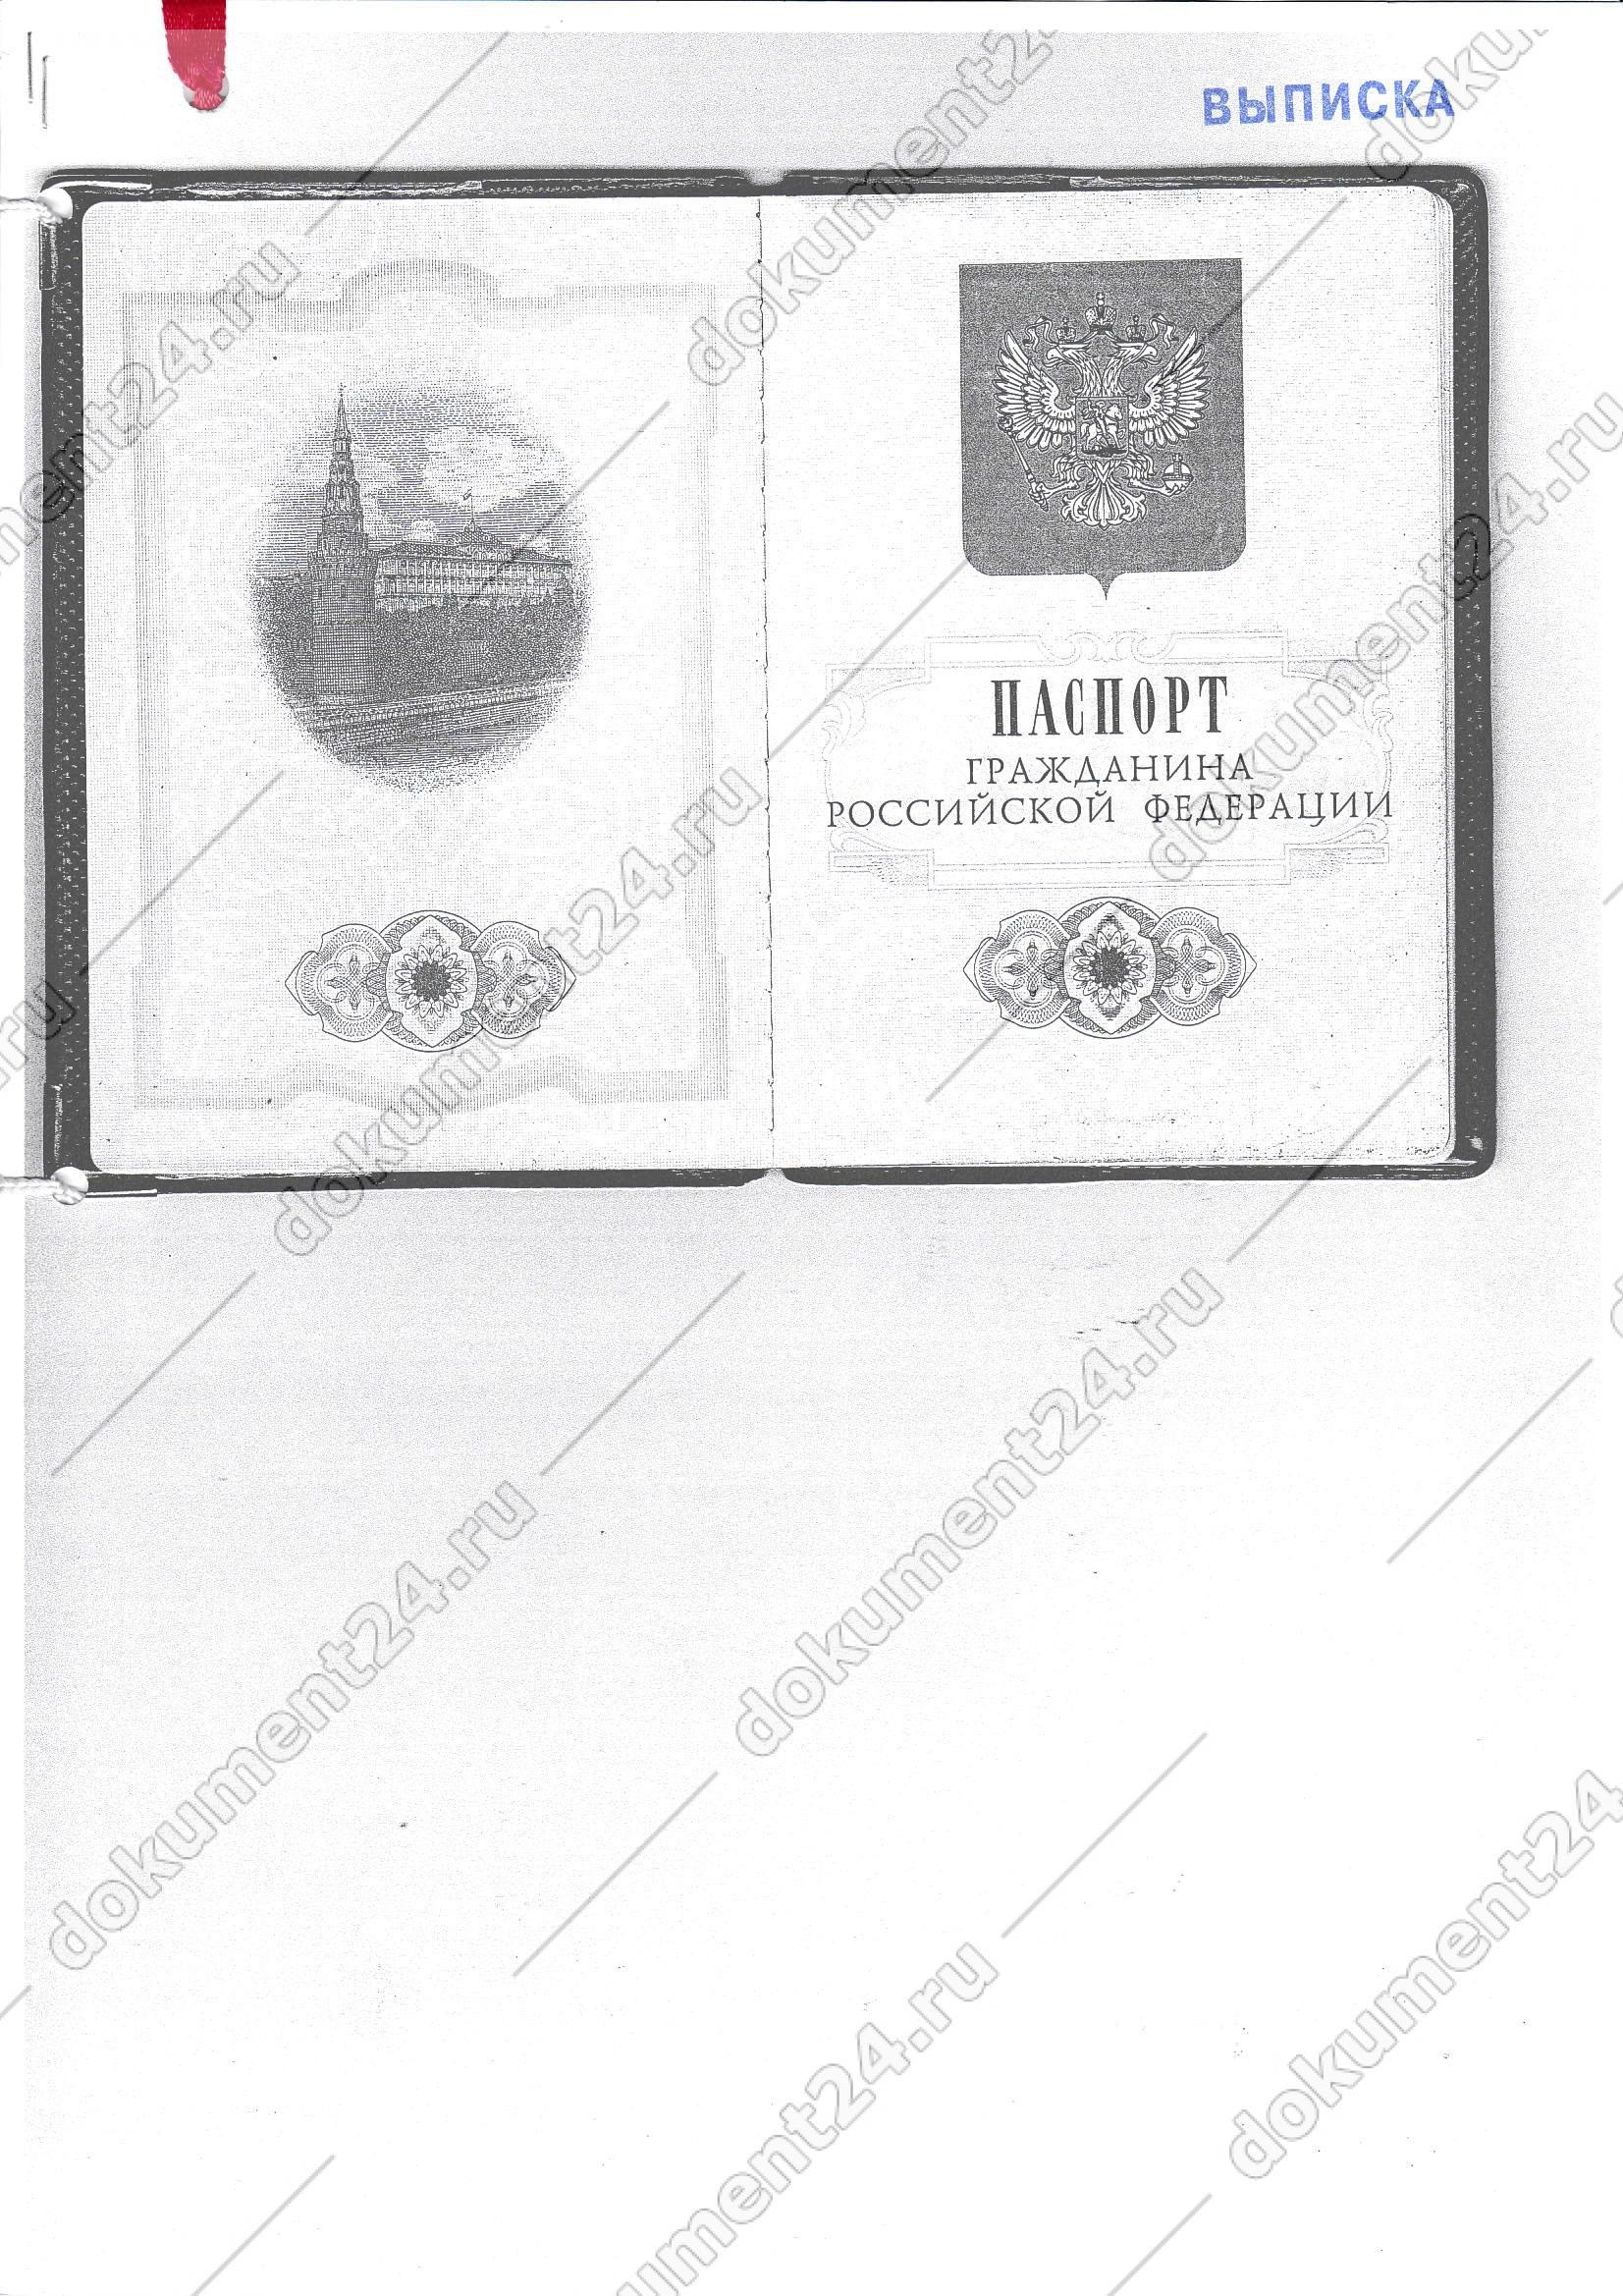 rossiiskii pasport kitai